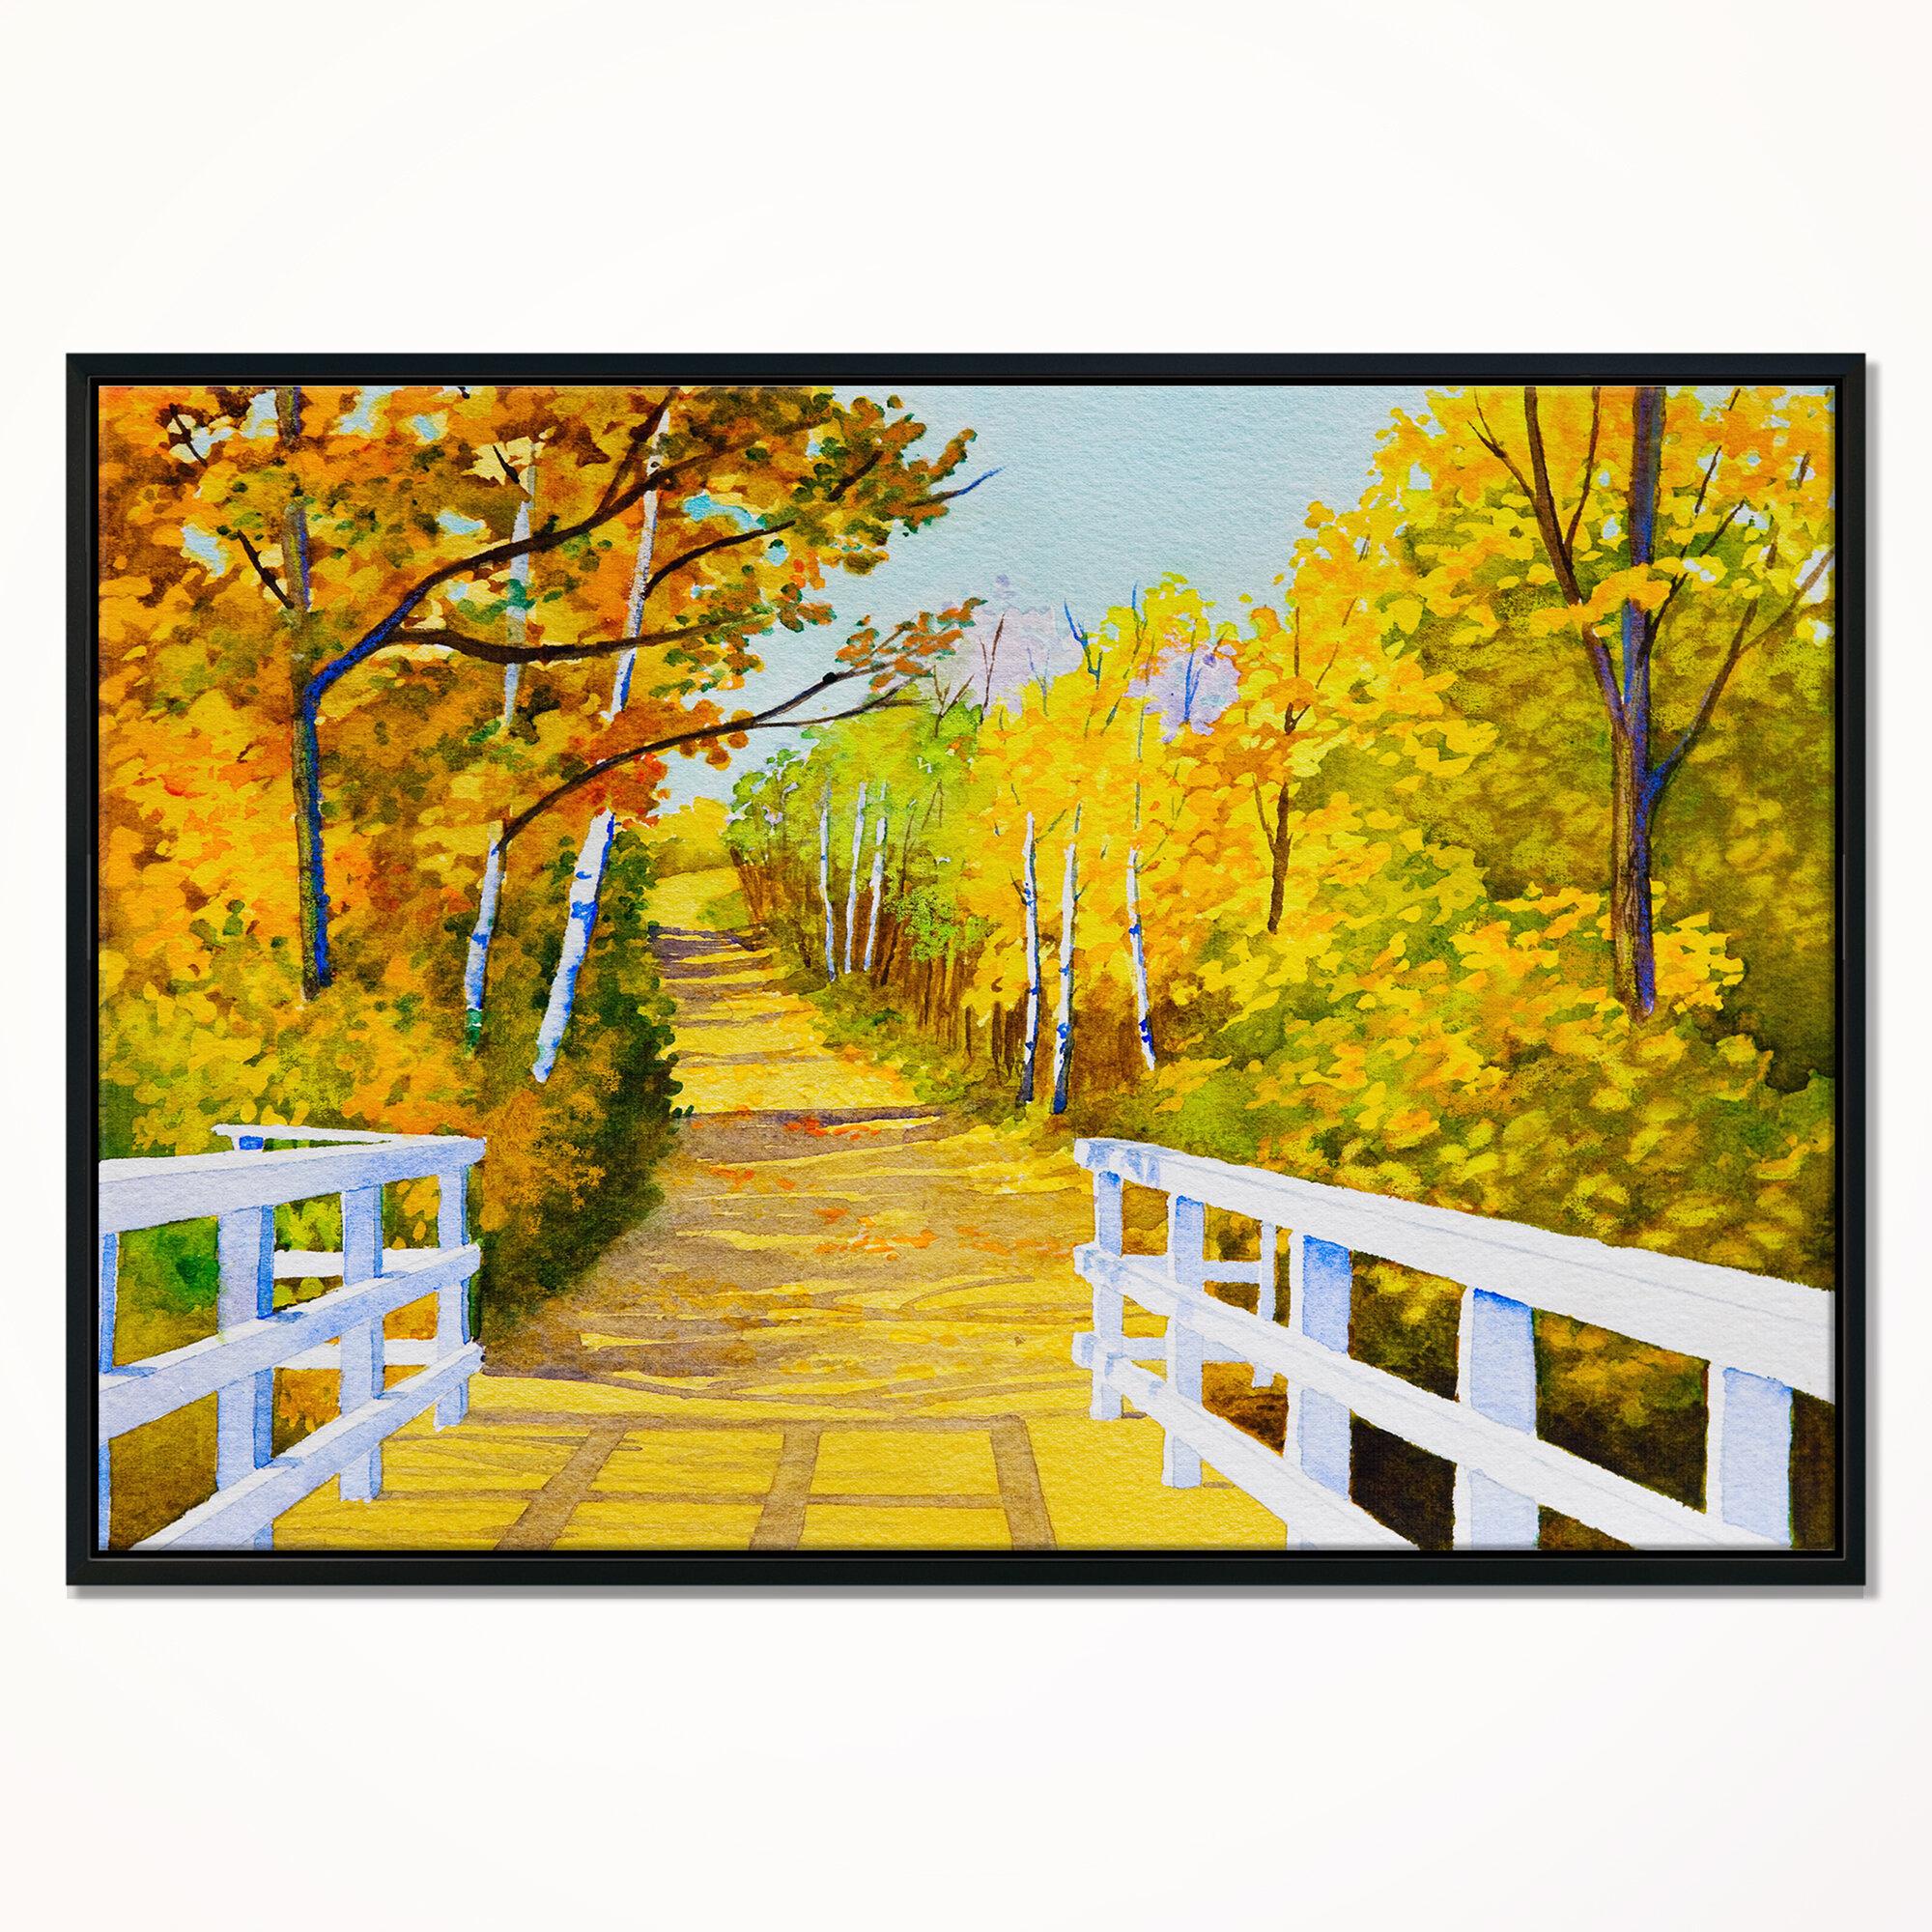 East Urban Home \'Parkland Trails\' Framed Graphic Art Print on ...